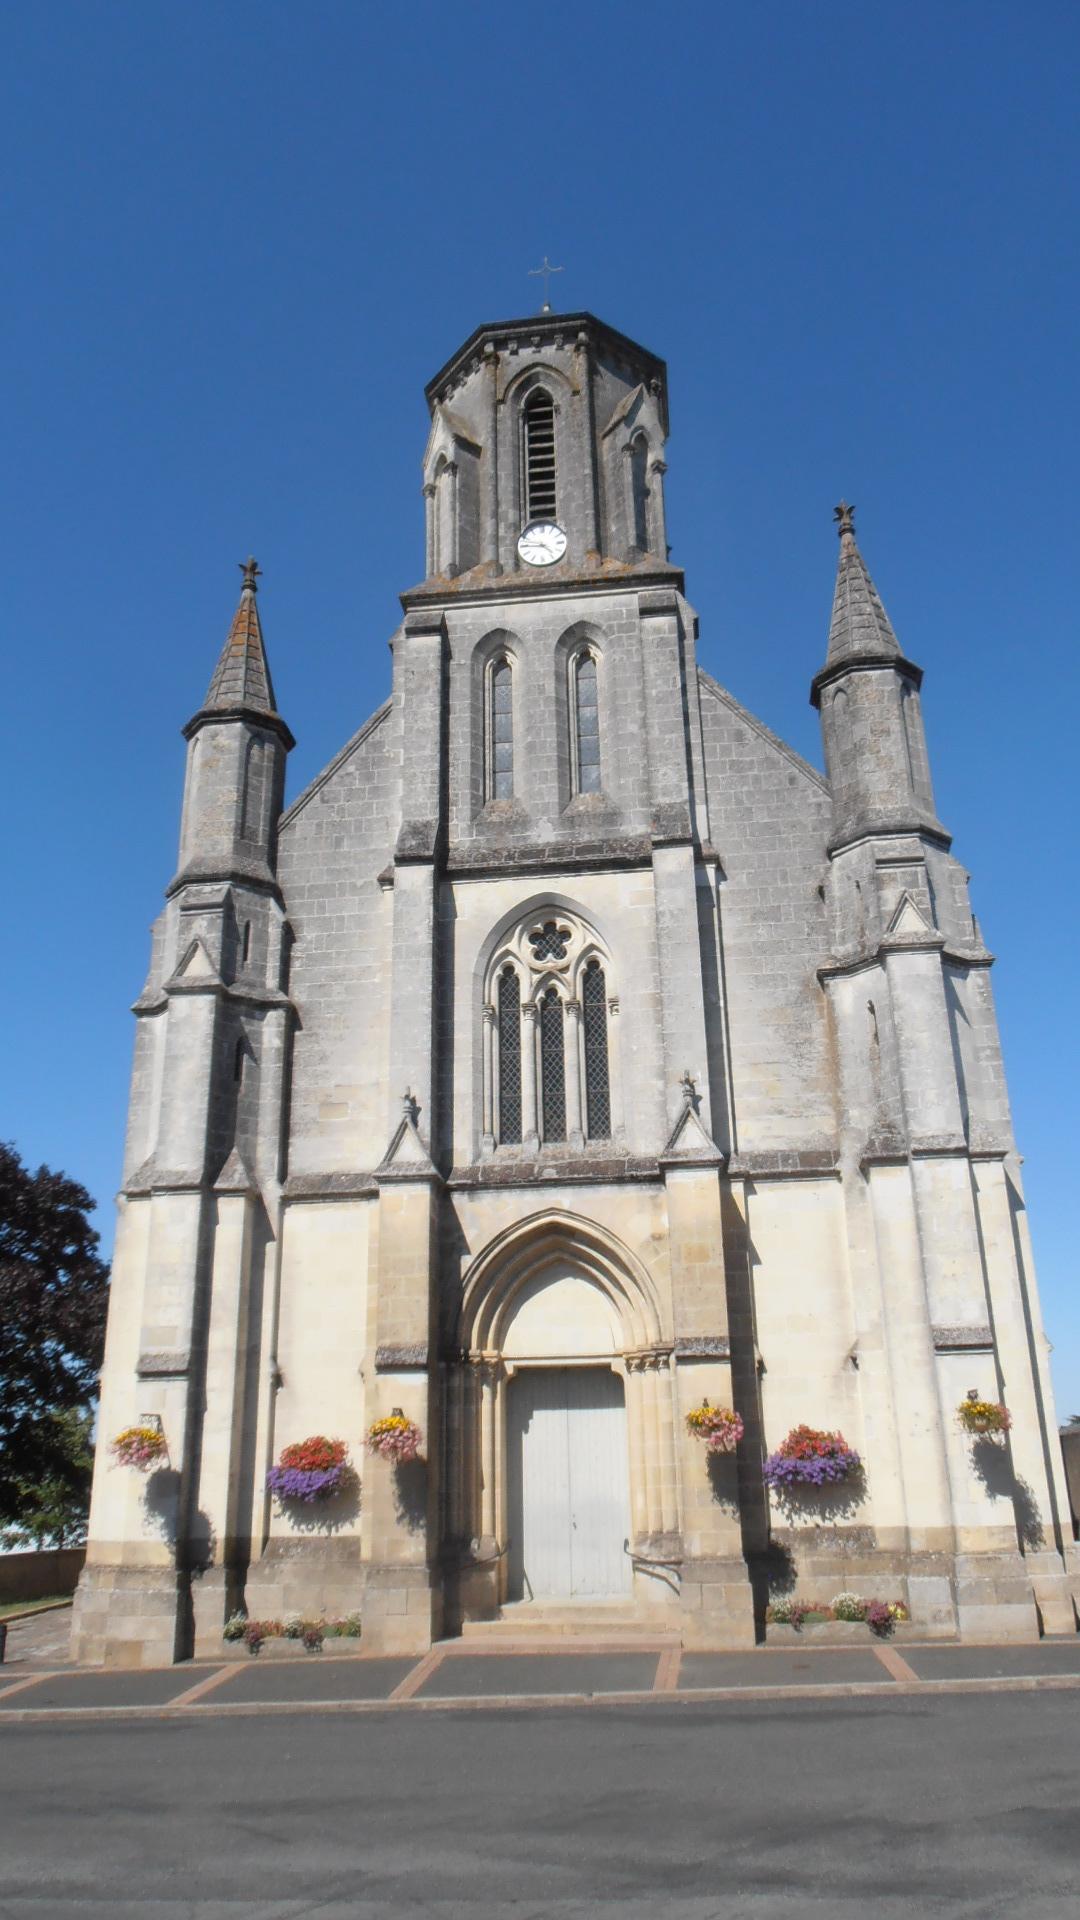 Saint-Laurent-du-Mottay